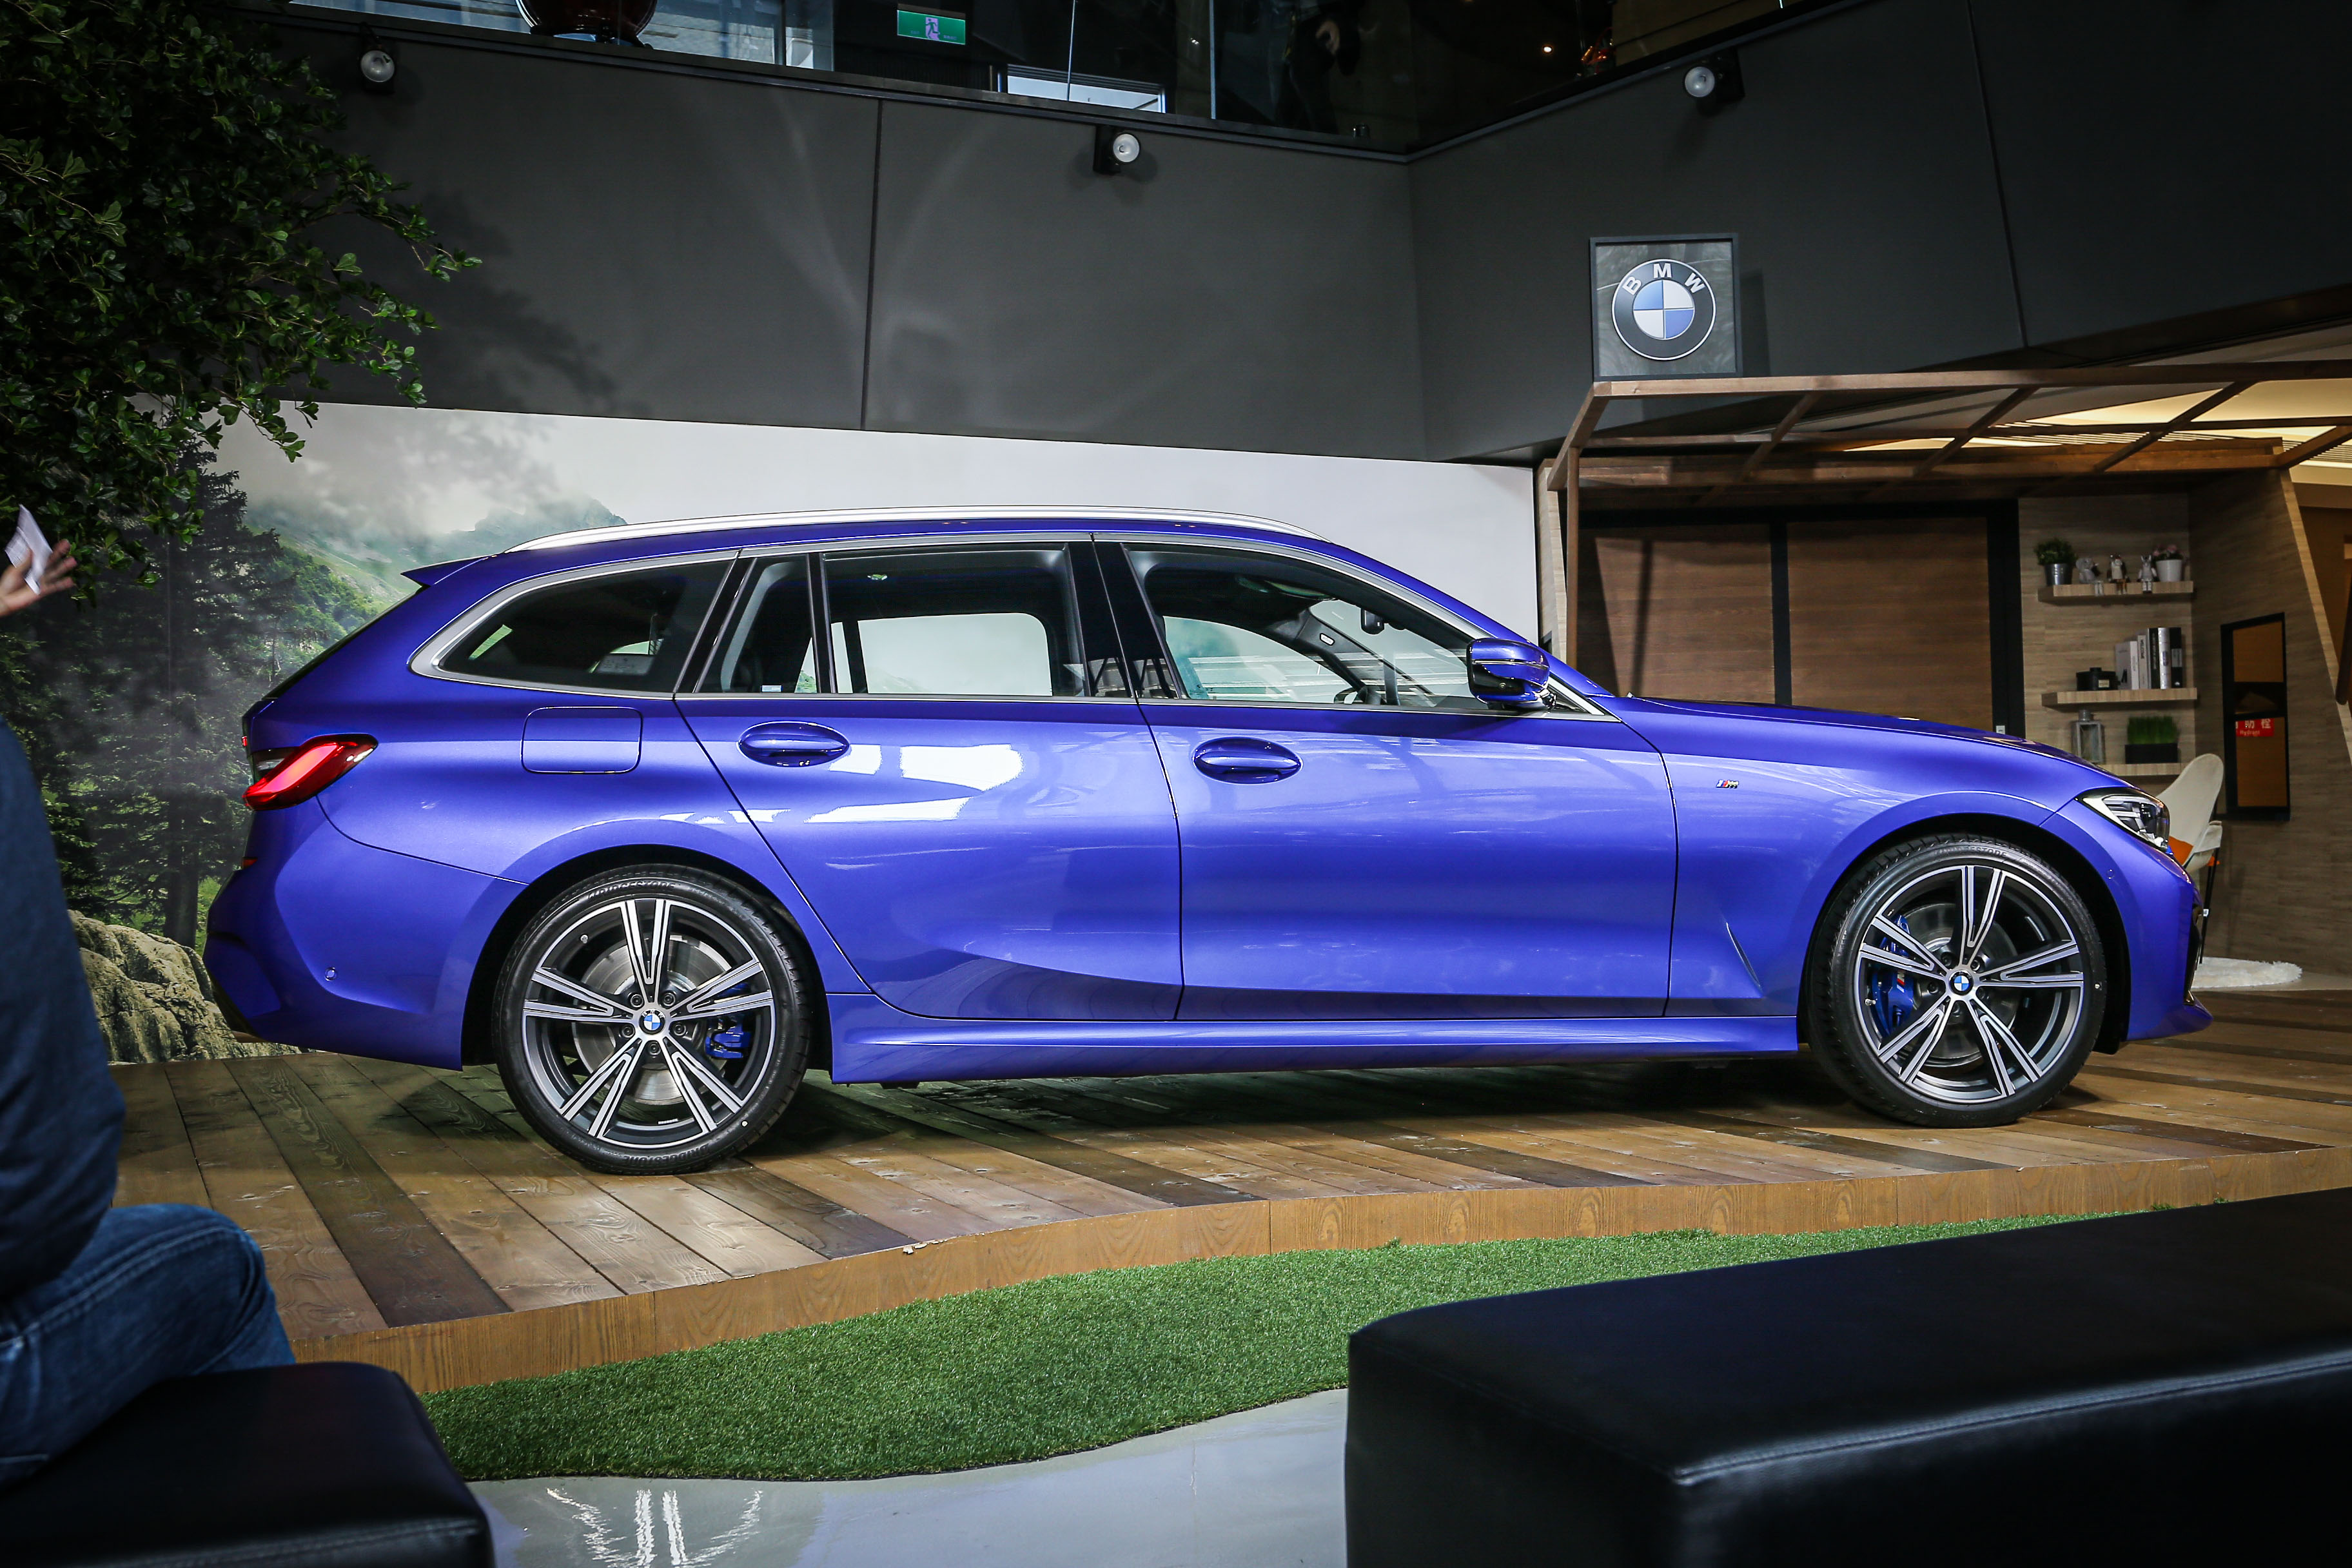 BMW M340i xDrive Touring 355 萬、330i Touring M Sport 285 萬、320i Touring M Sport 236 萬。